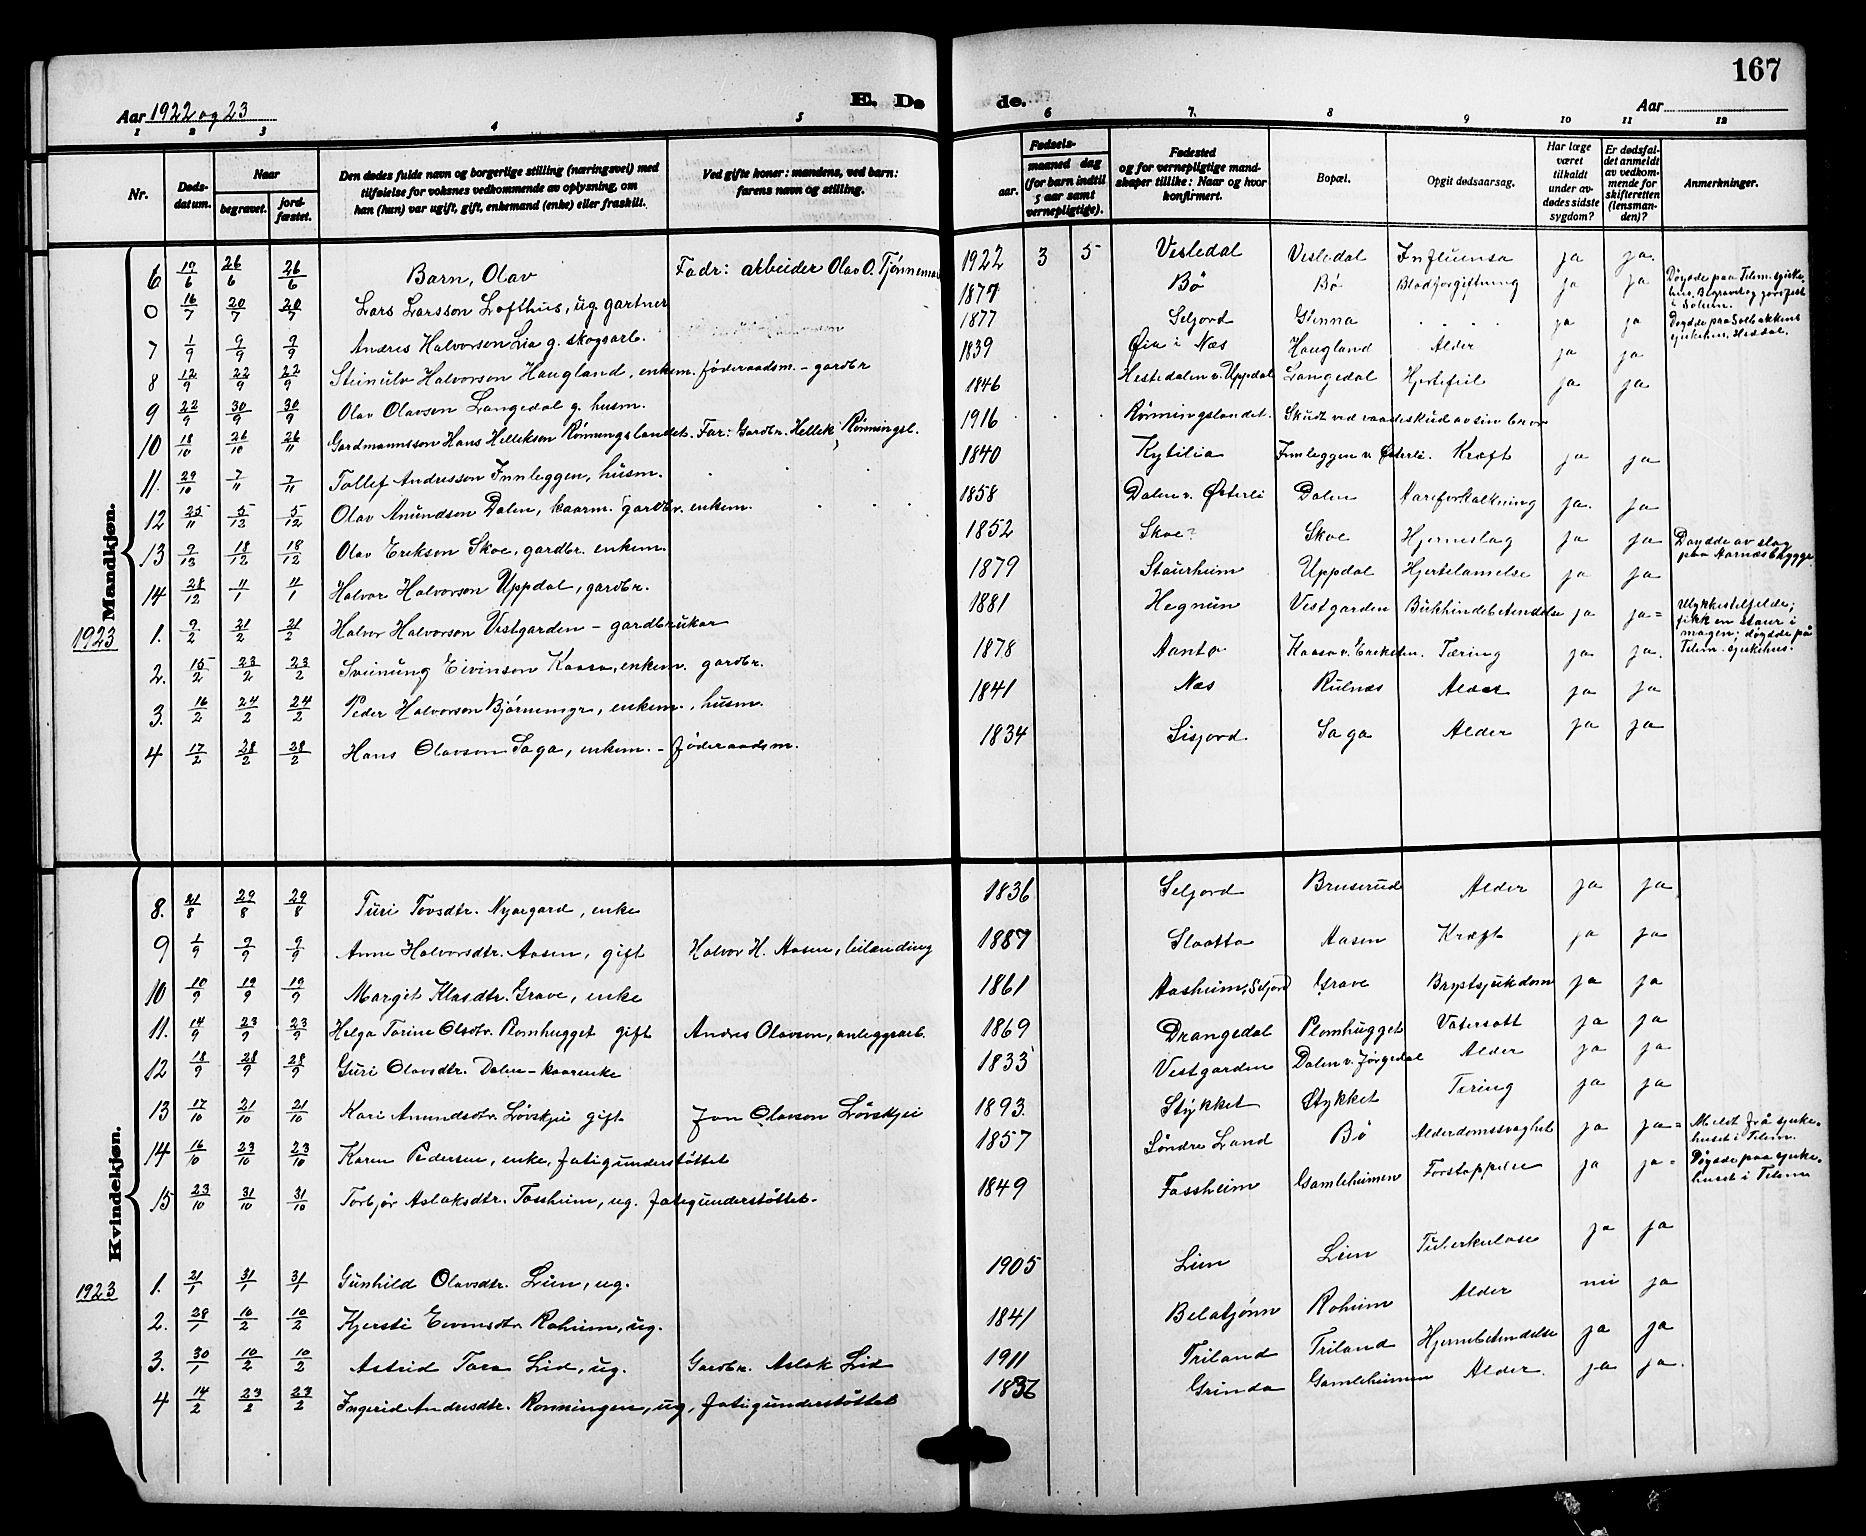 SAKO, Bø kirkebøker, G/Ga/L0007: Klokkerbok nr. 7, 1909-1924, s. 167